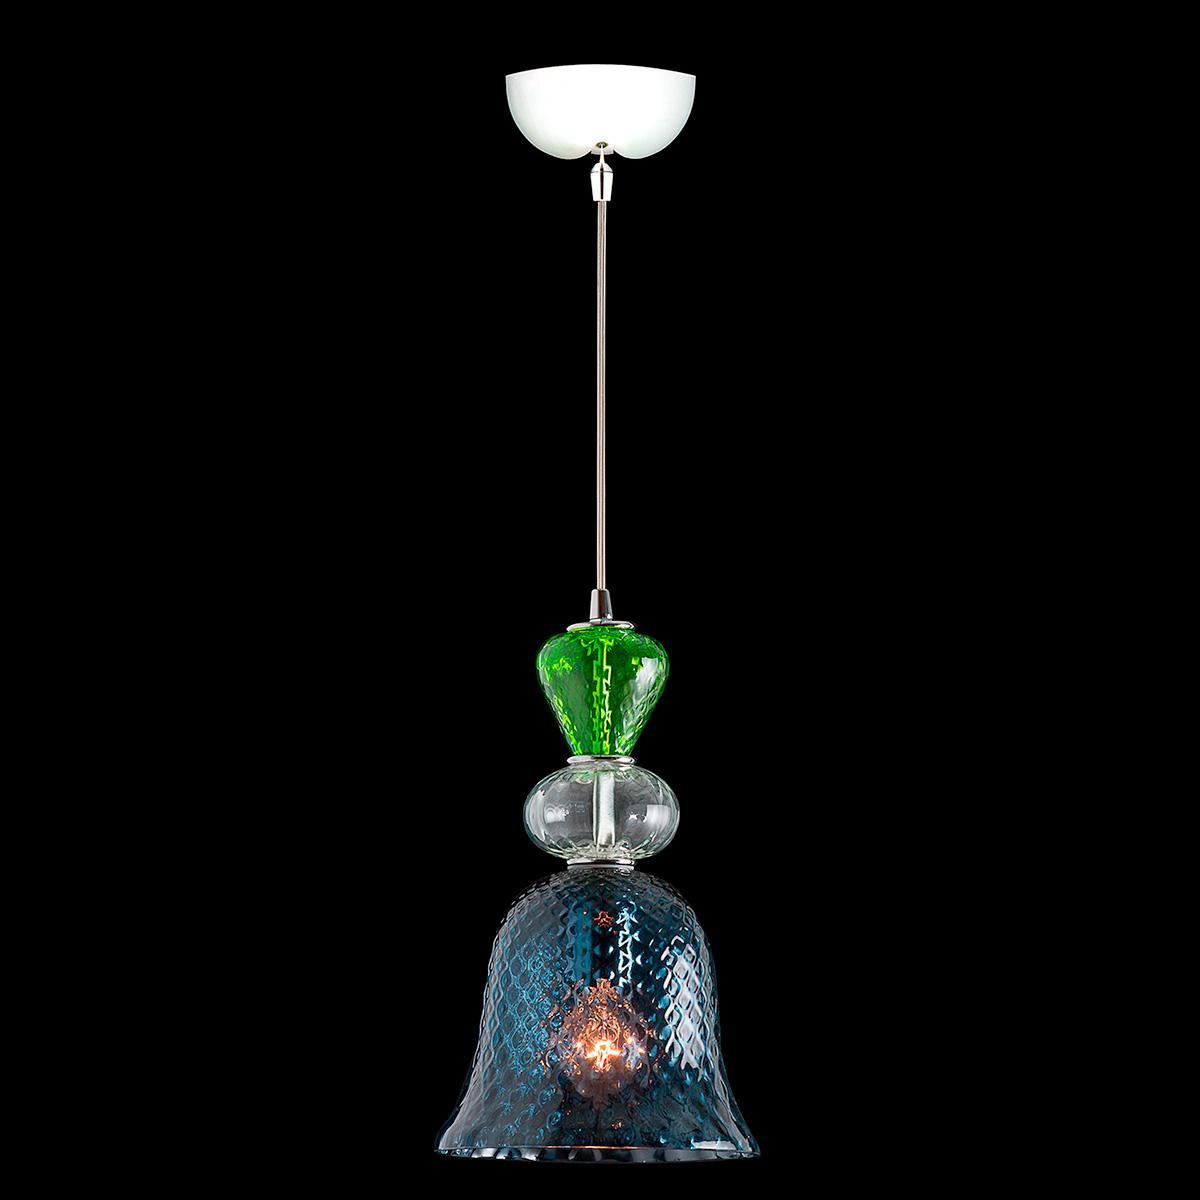 """Herbie"" Murano glas hangeleuchte - 1 flammig - multicolor"